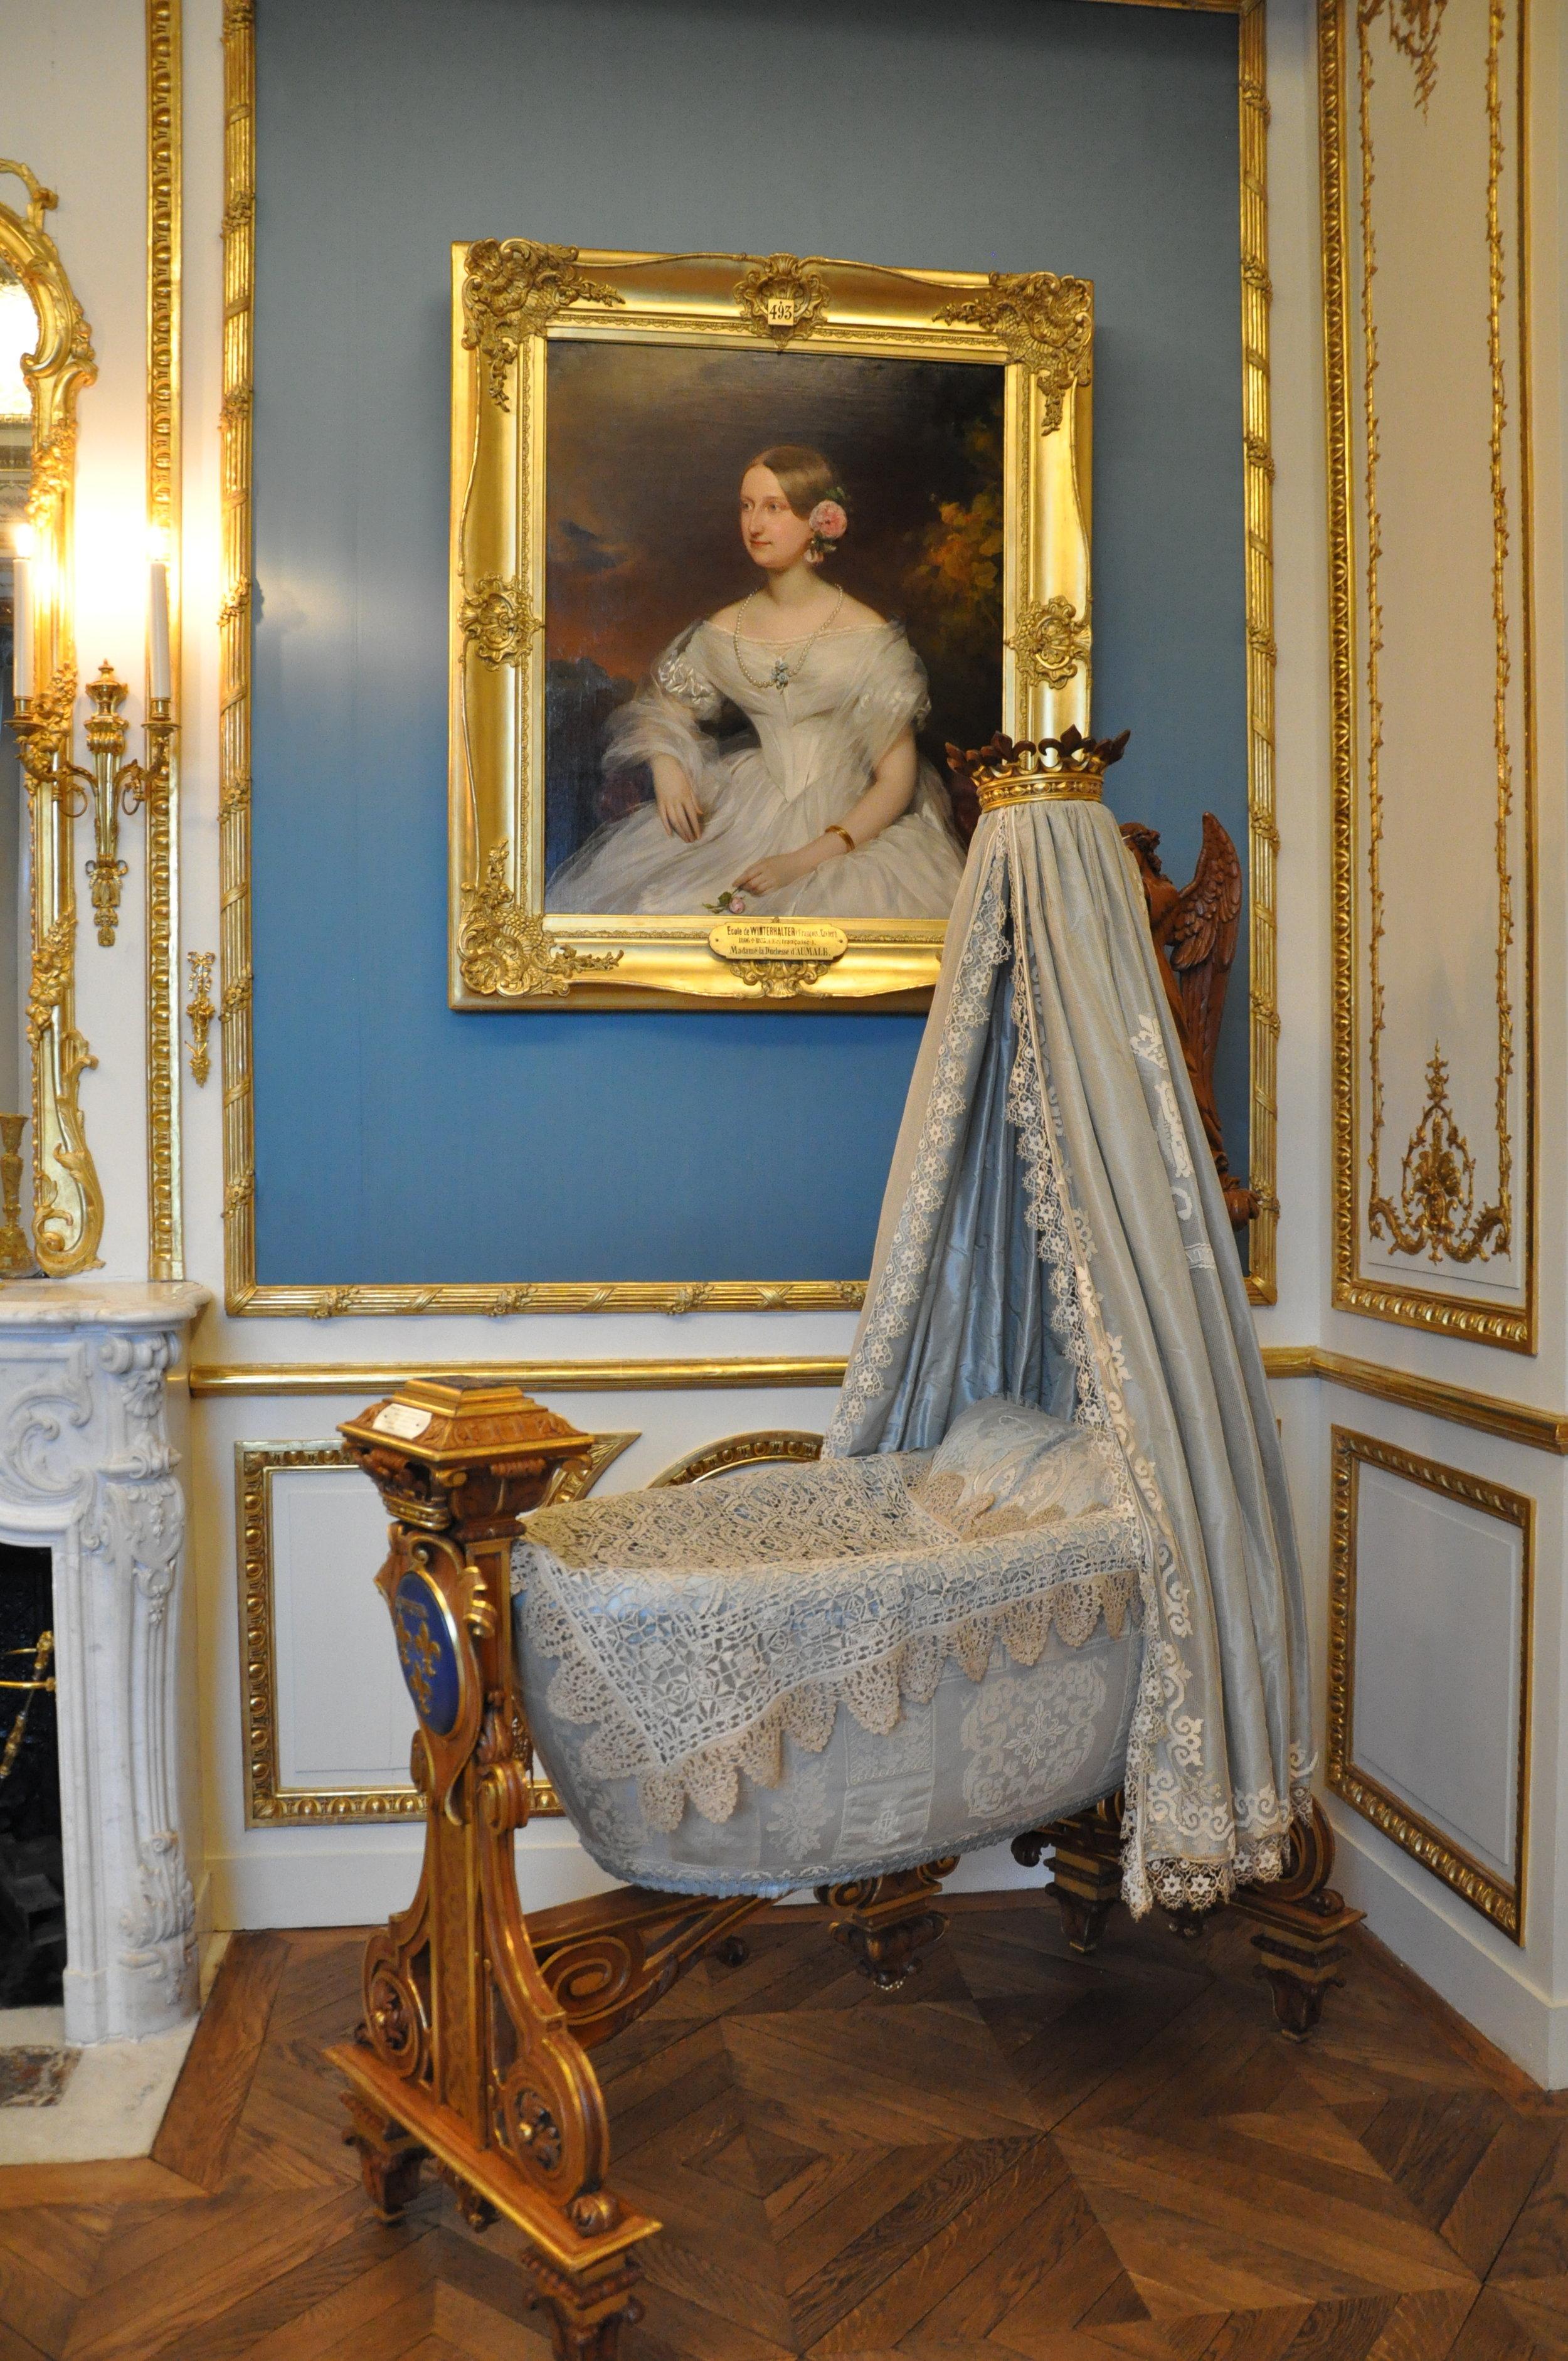 Duke of Guise's cradle in the Duchess' bedroom with portrait of his mother, Marie-Caroline-Augusta de Bourbon-Siciles, Duchess of Aumale (1822-1869) by Franz Schrotzberg © Grand Palais Domaine de Chantilly